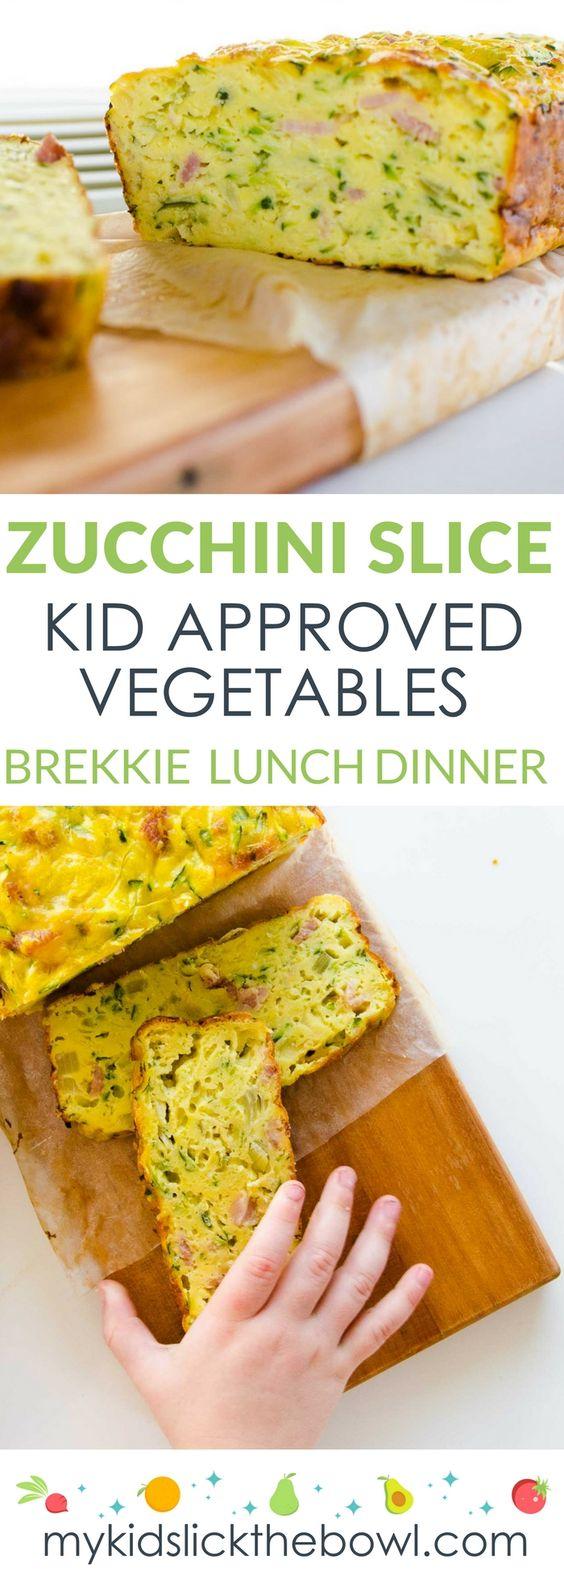 Zucchini Slice